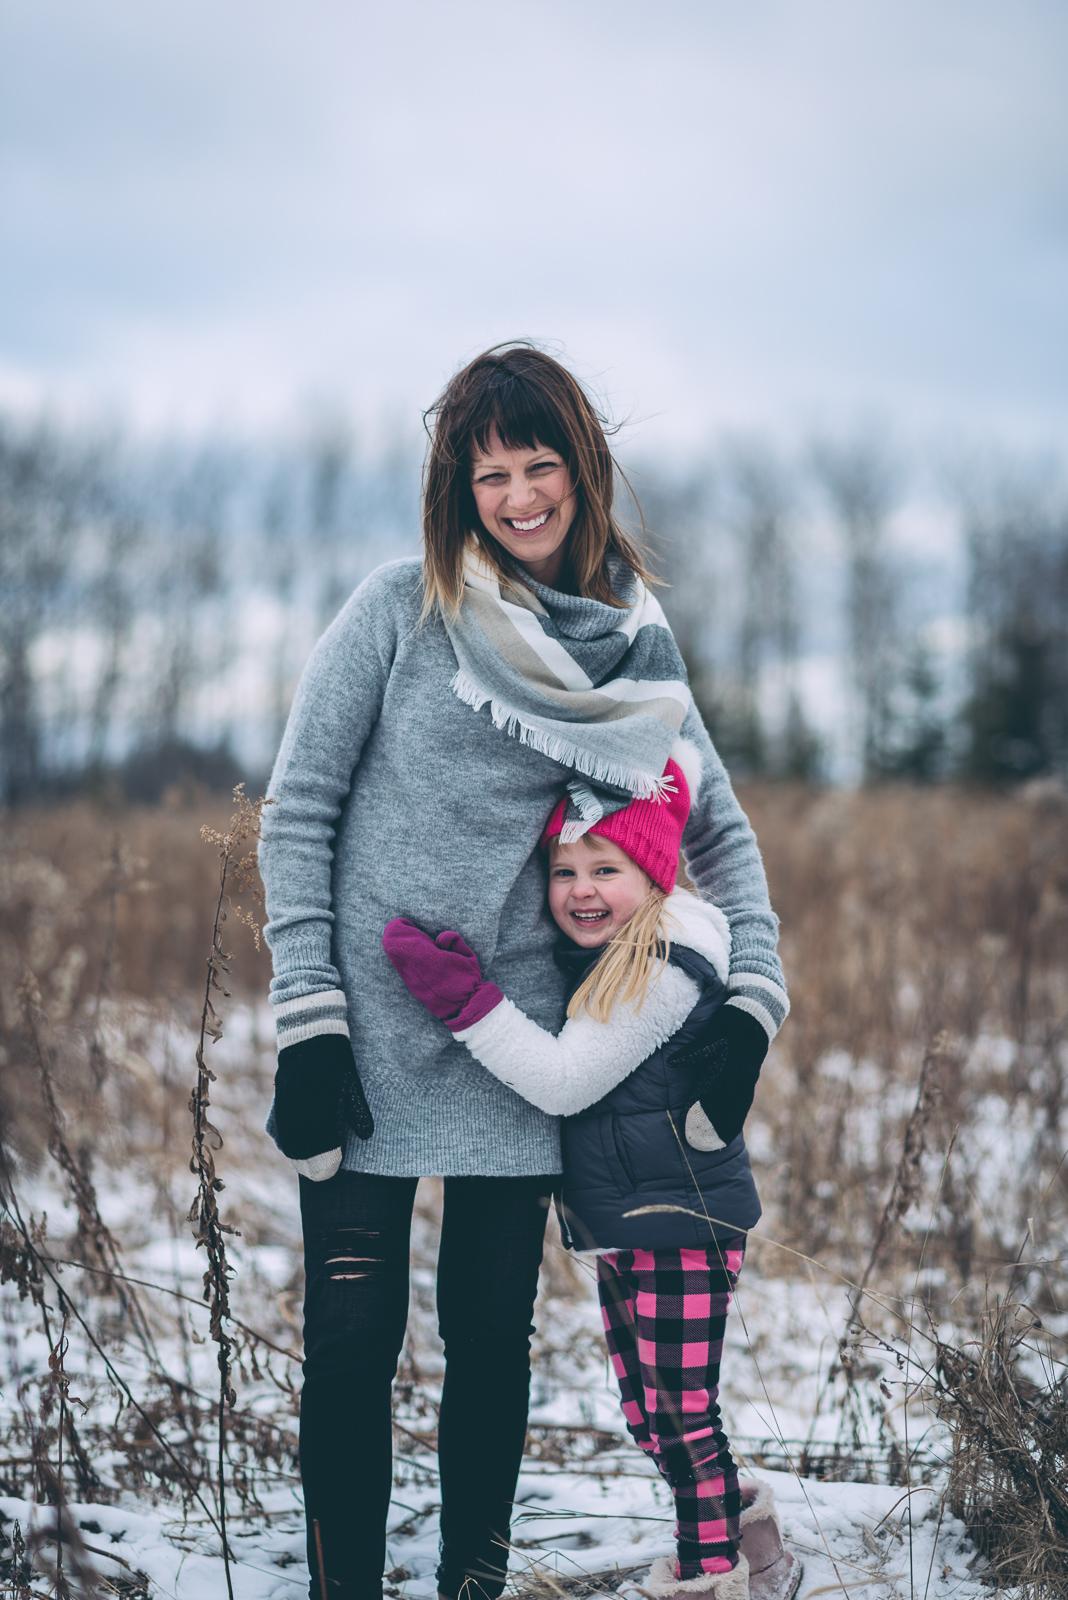 heather-family-portraits-120218-blog-8.jpg